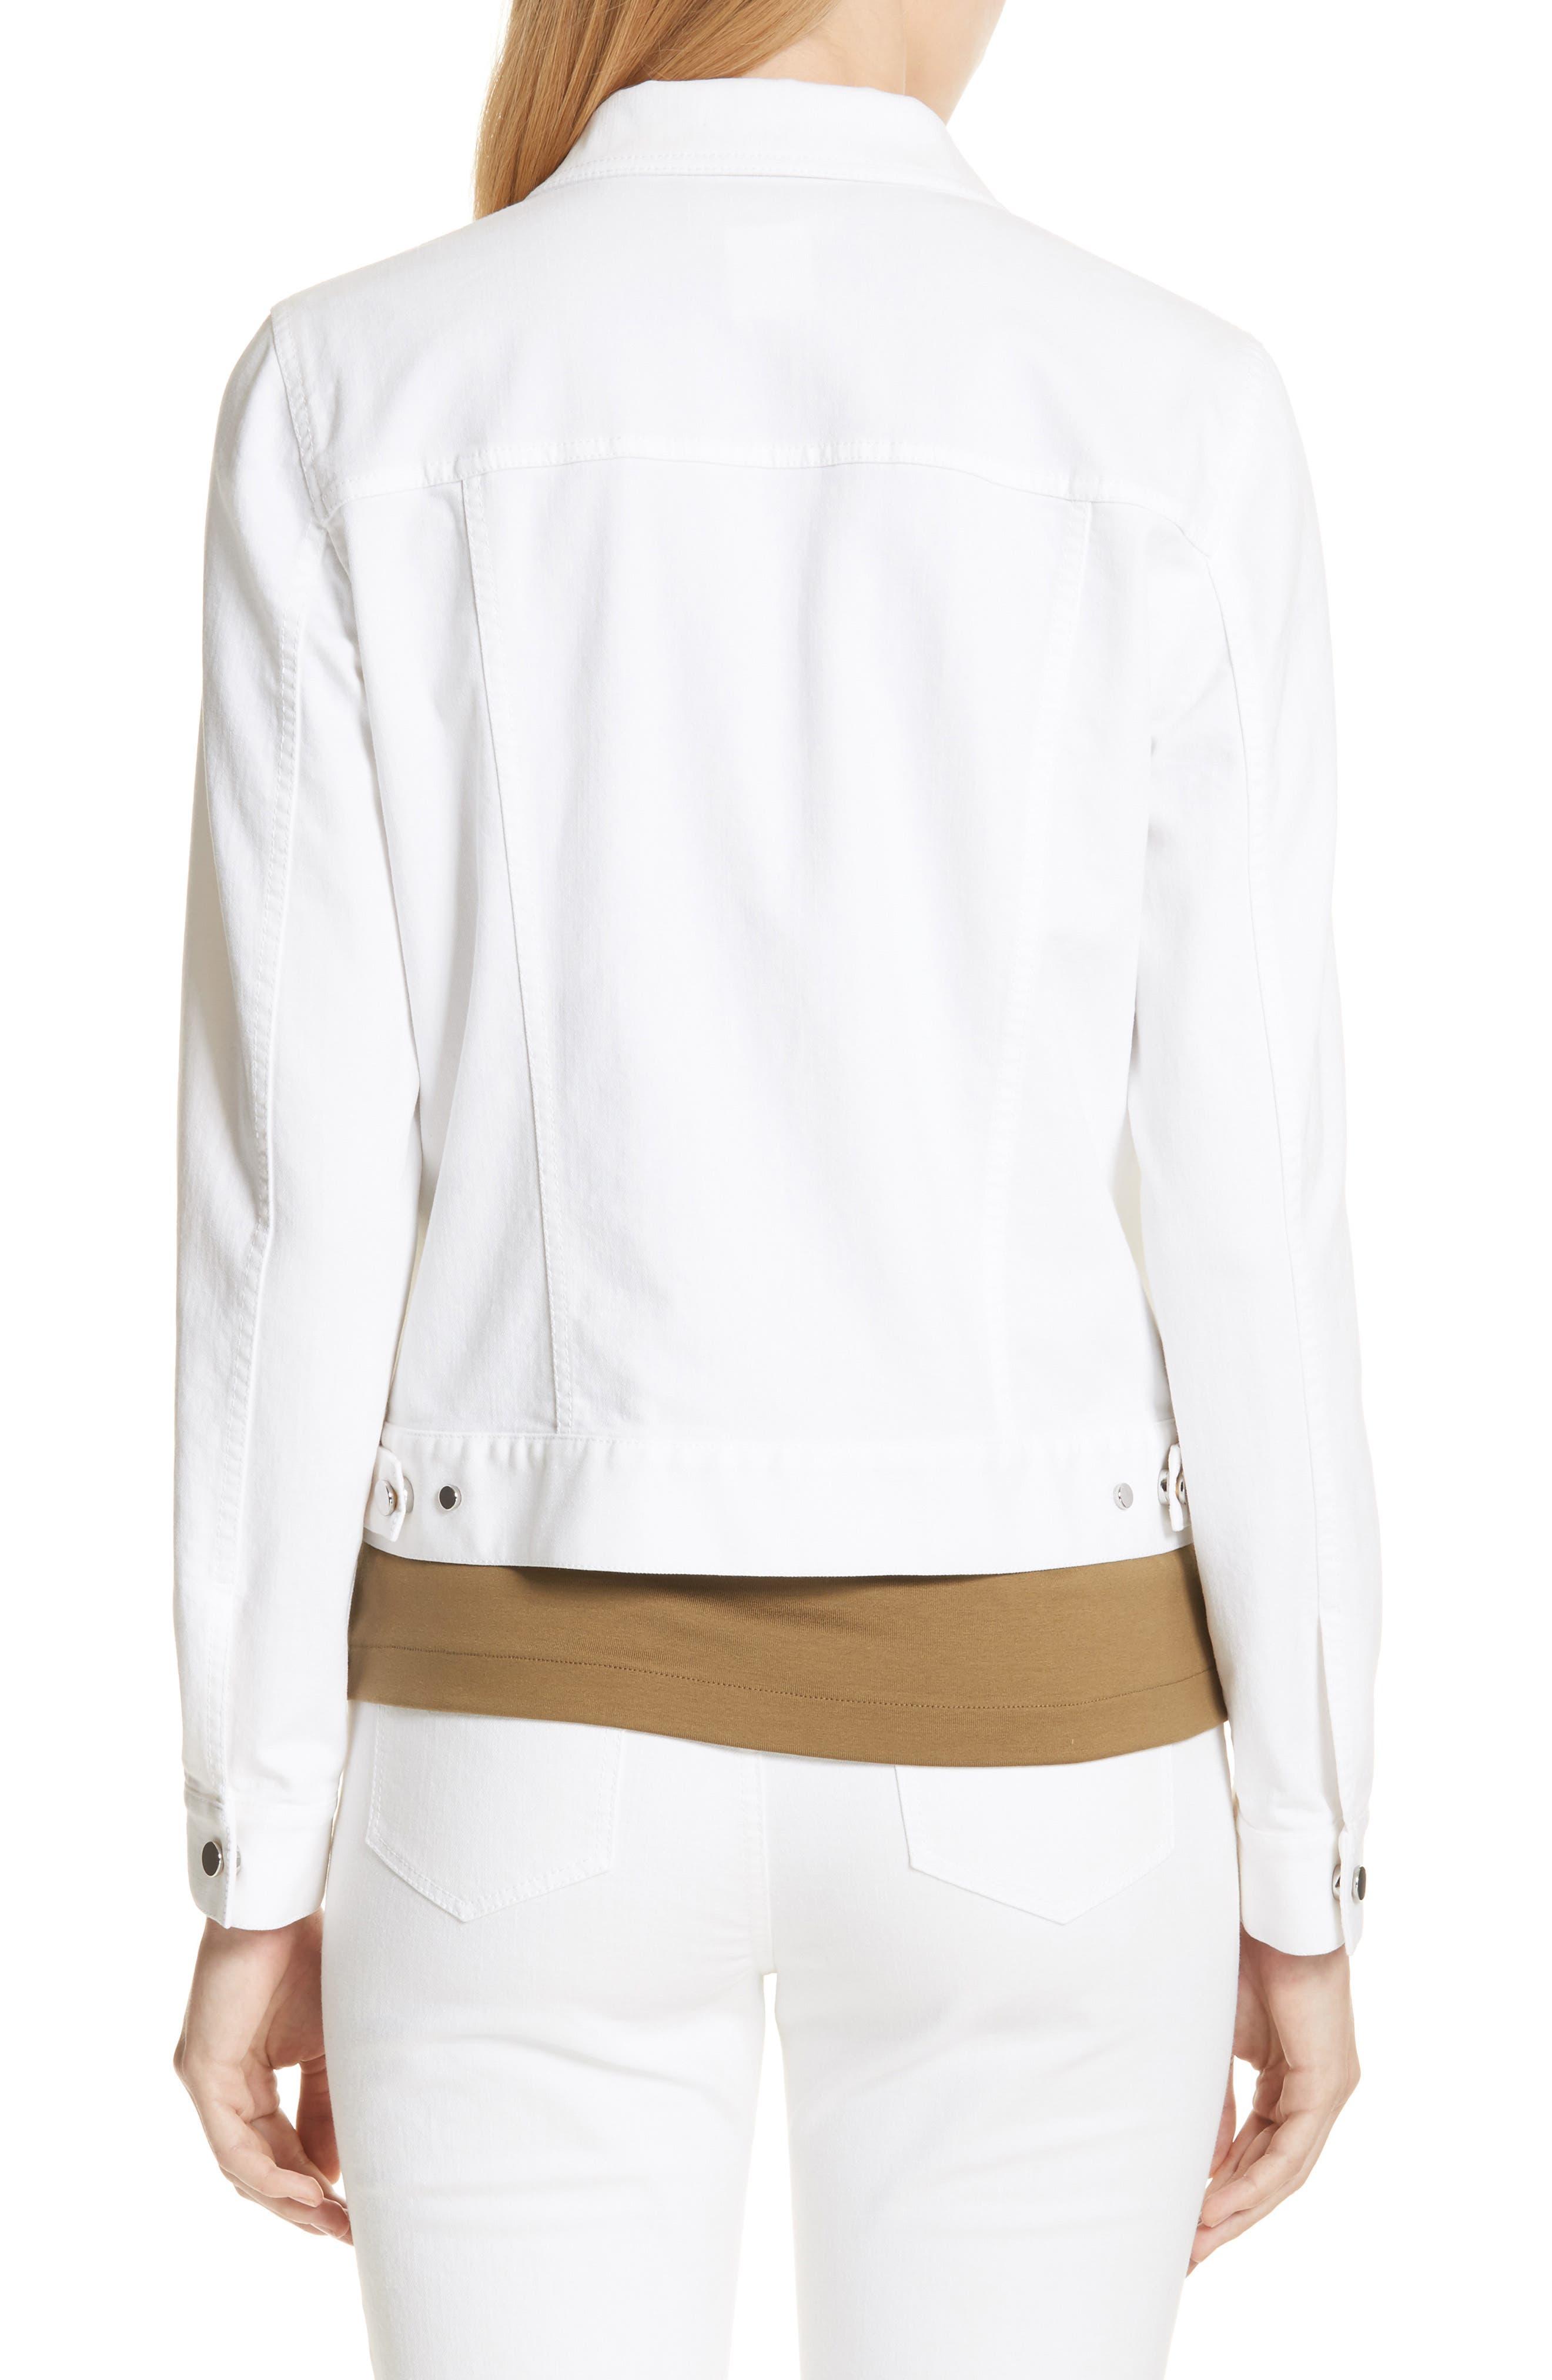 Destiny Denim Jacket,                             Alternate thumbnail 2, color,                             White